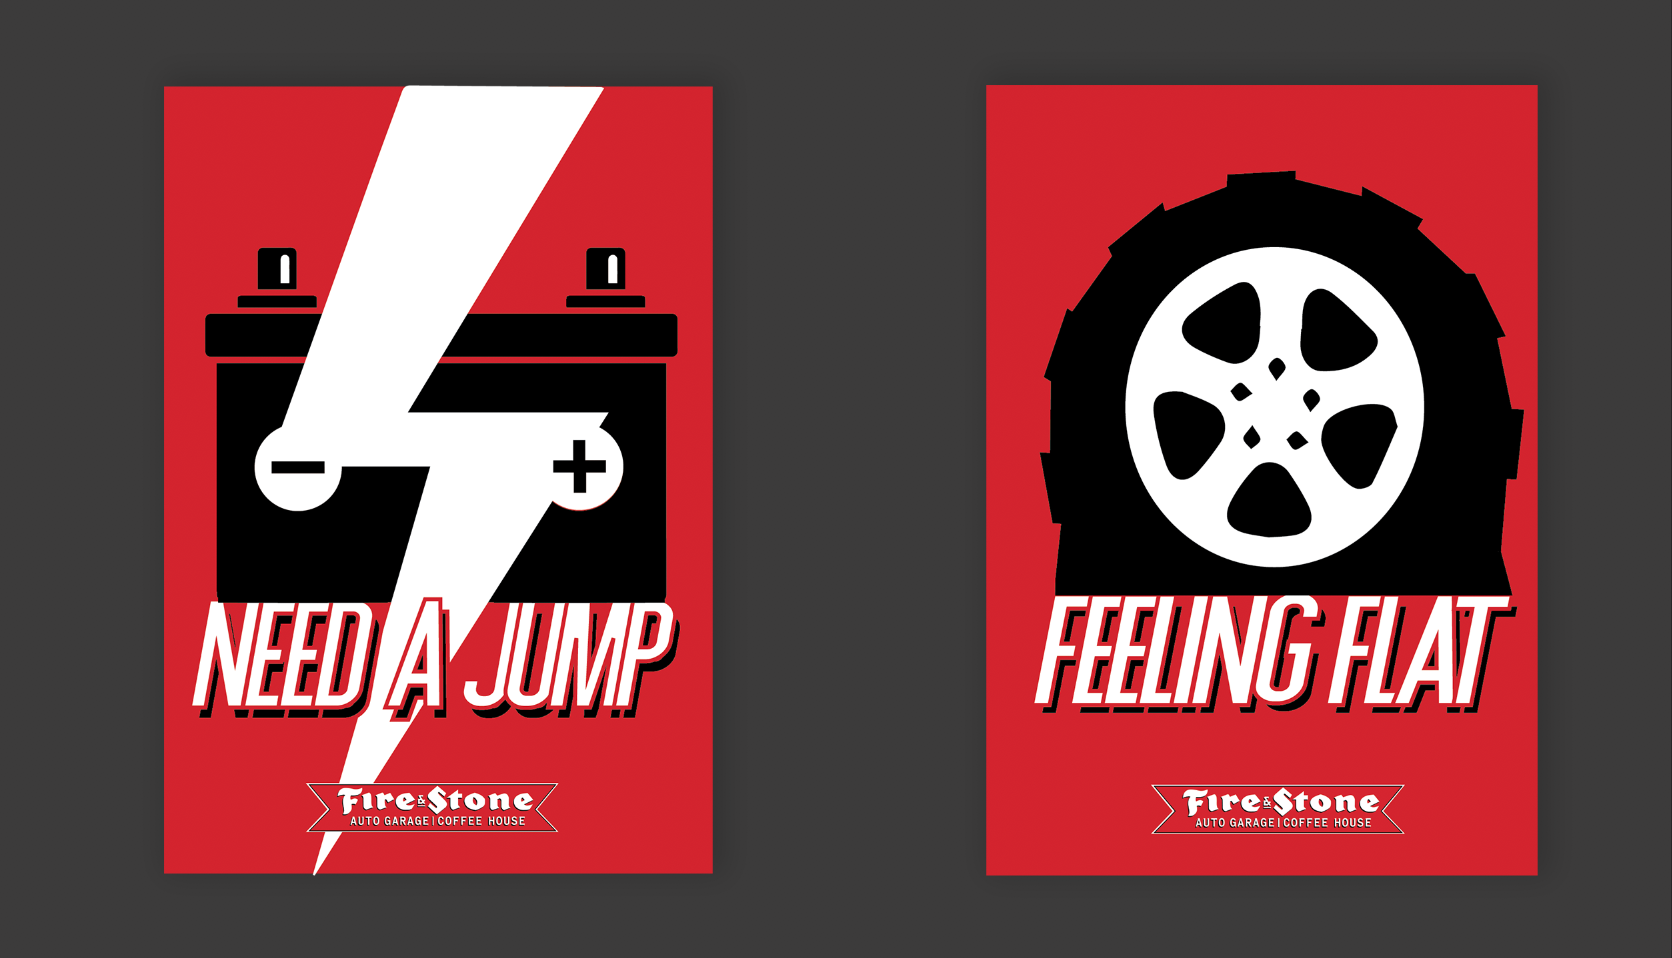 Poster designs.